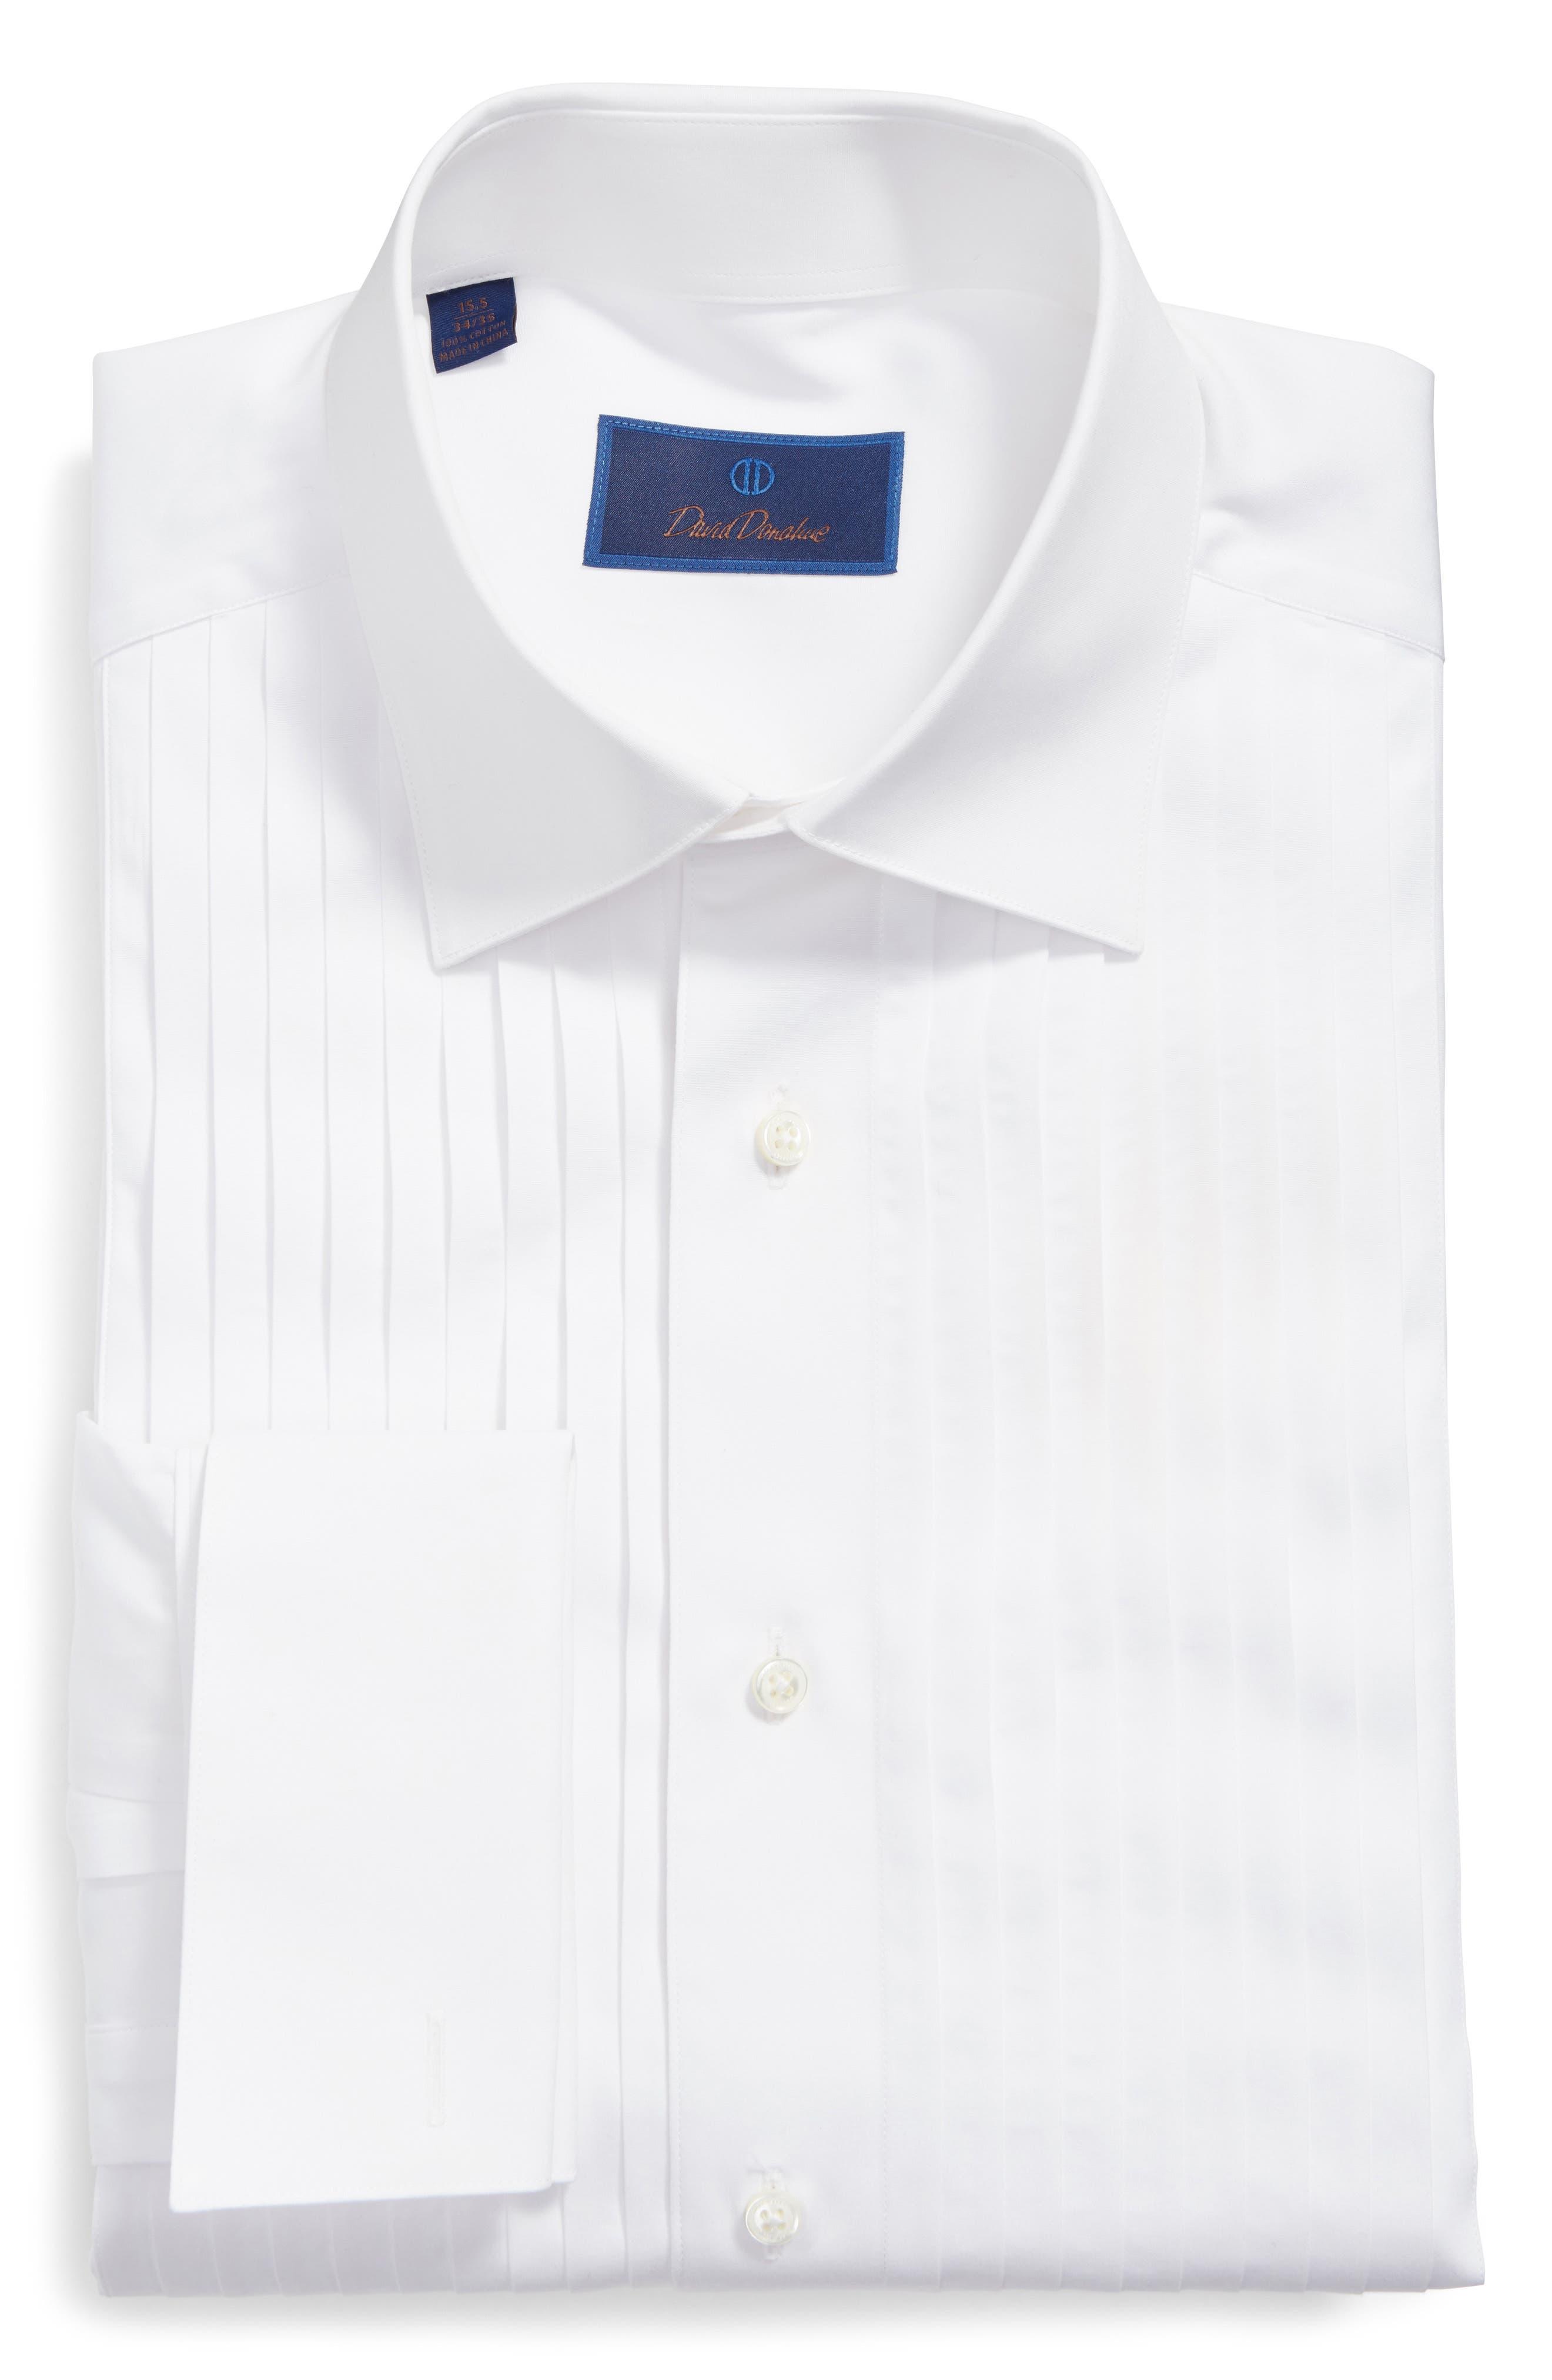 DAVID DONAHUE, Regular Fit French Cuff Tuxedo Shirt, Main thumbnail 1, color, WHITE